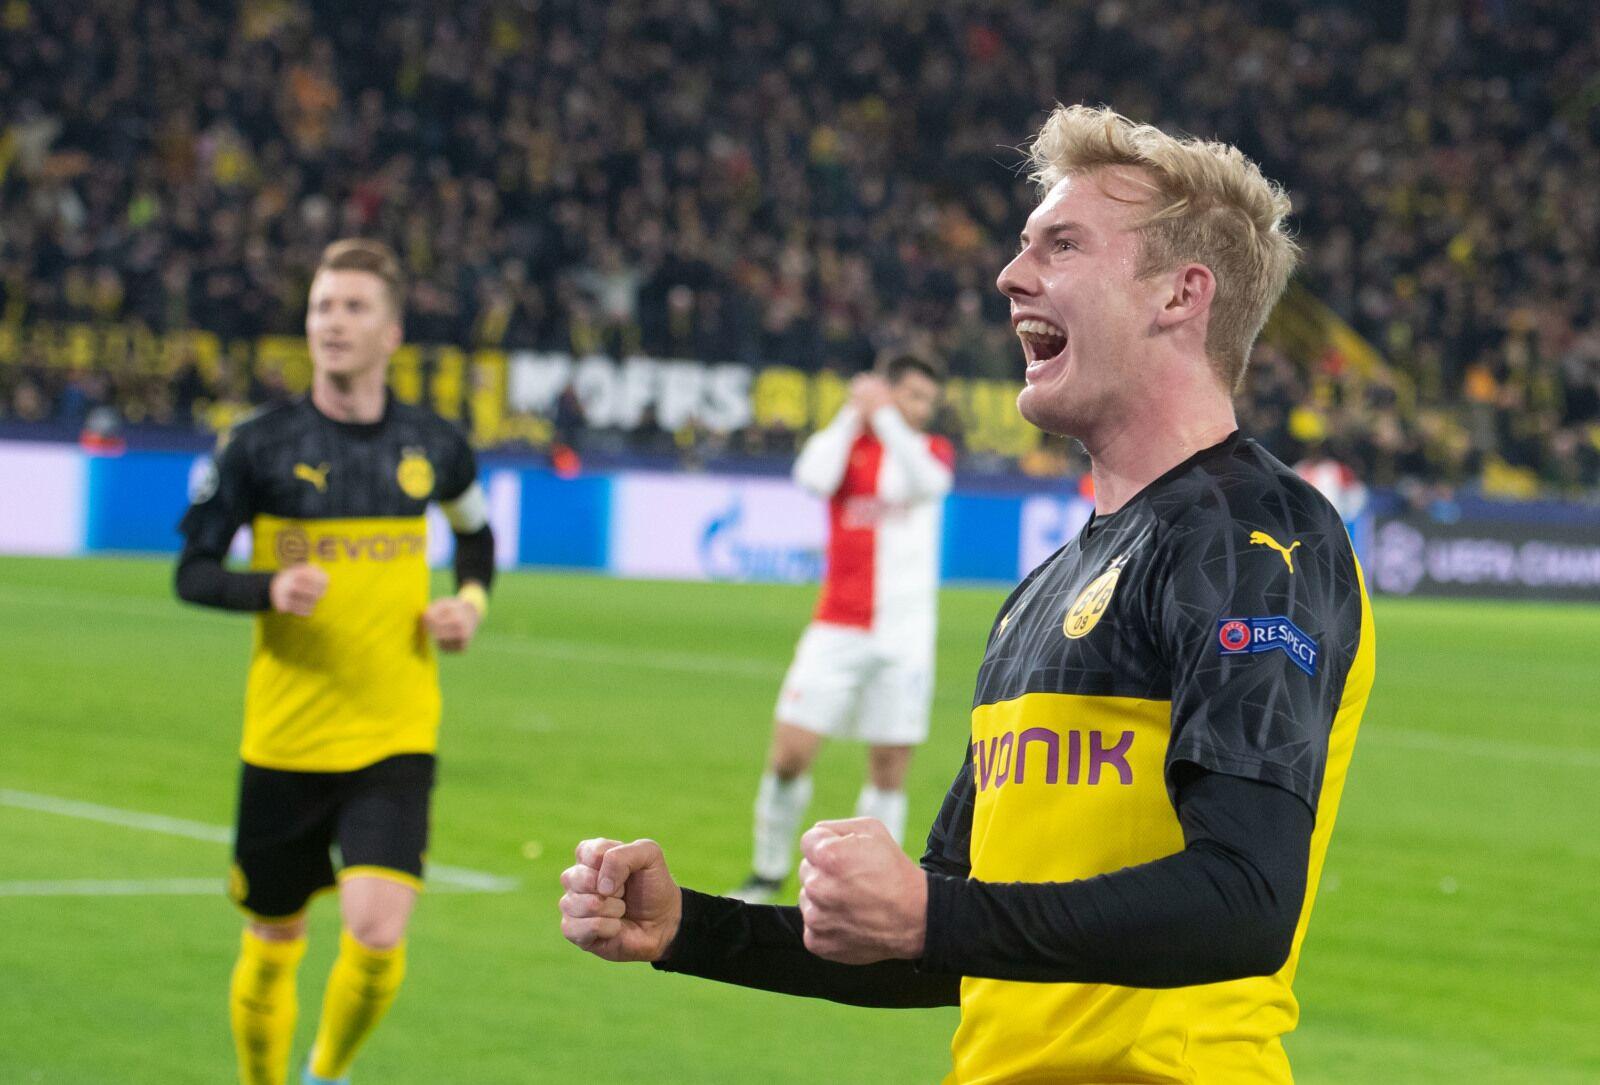 Borussia Dortmund through to Champions League knockout rounds with narrow win over Slavia Praha